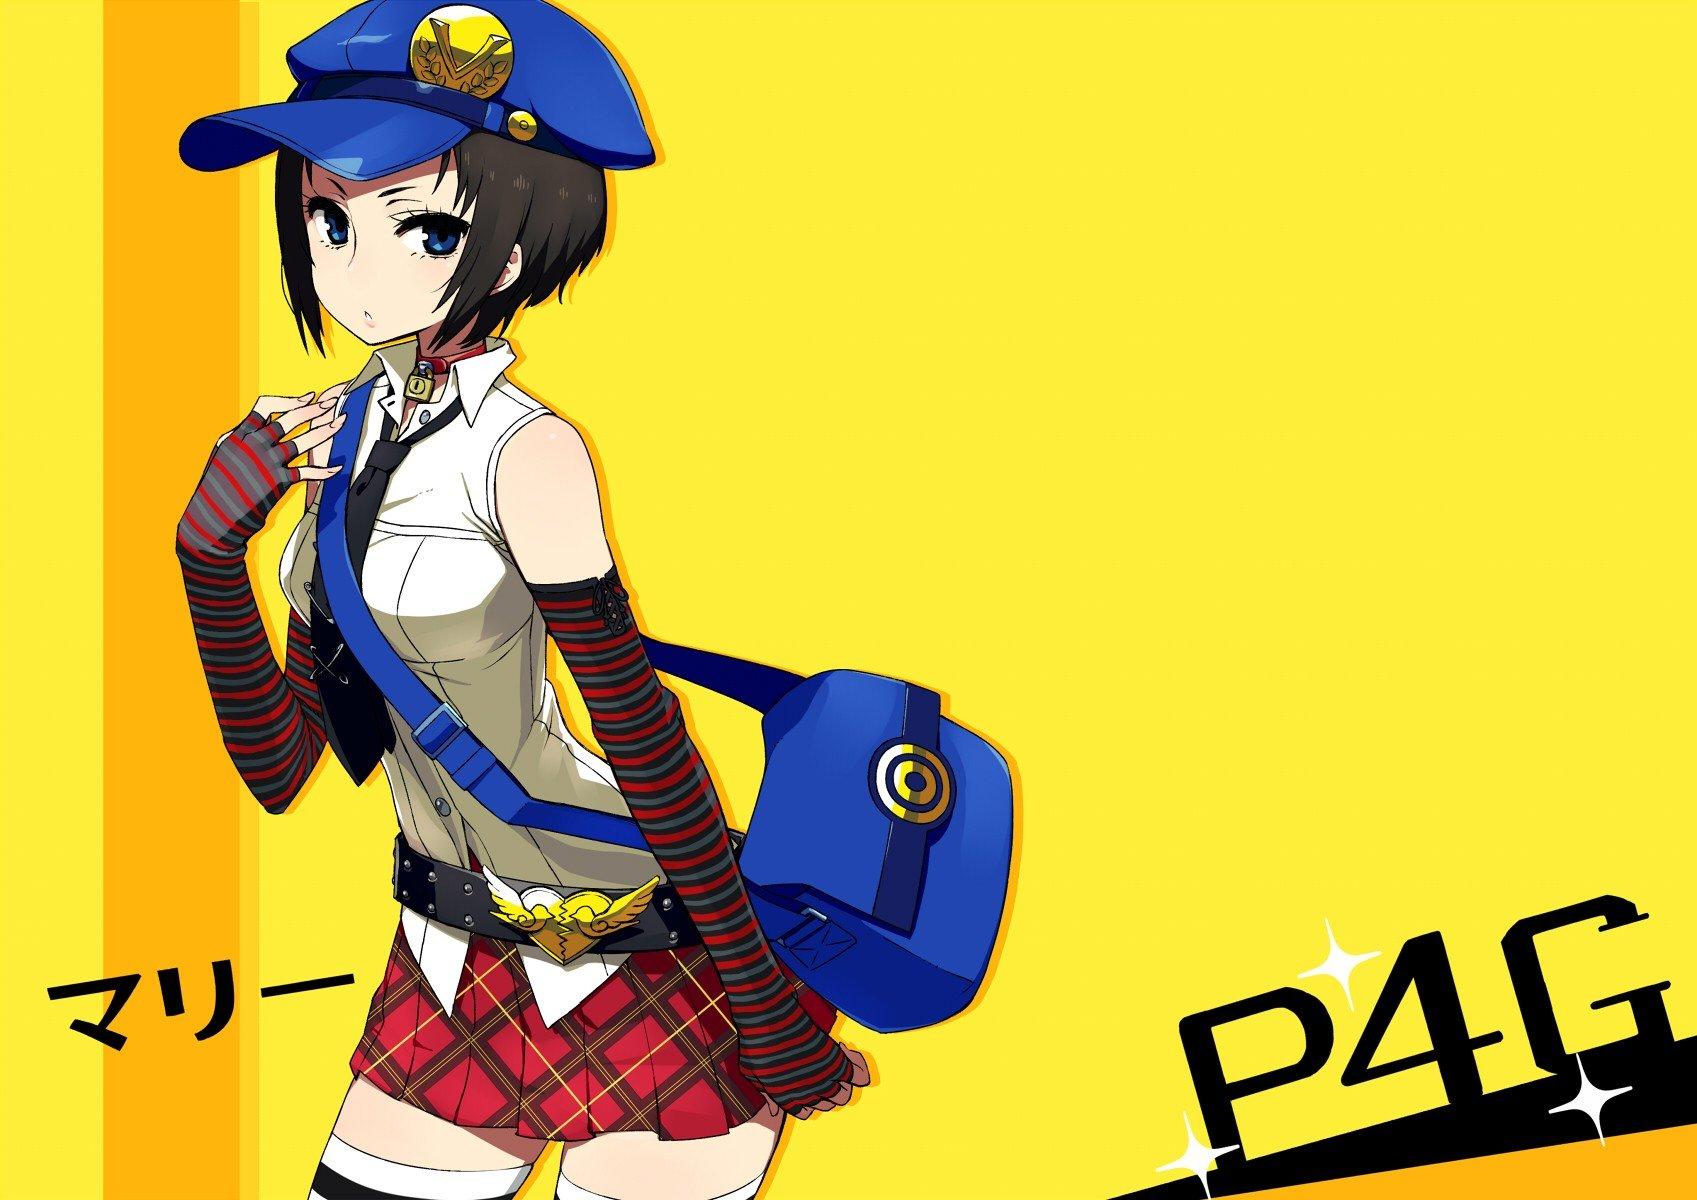 Free download Persona series Persona 4 persona 4 golden